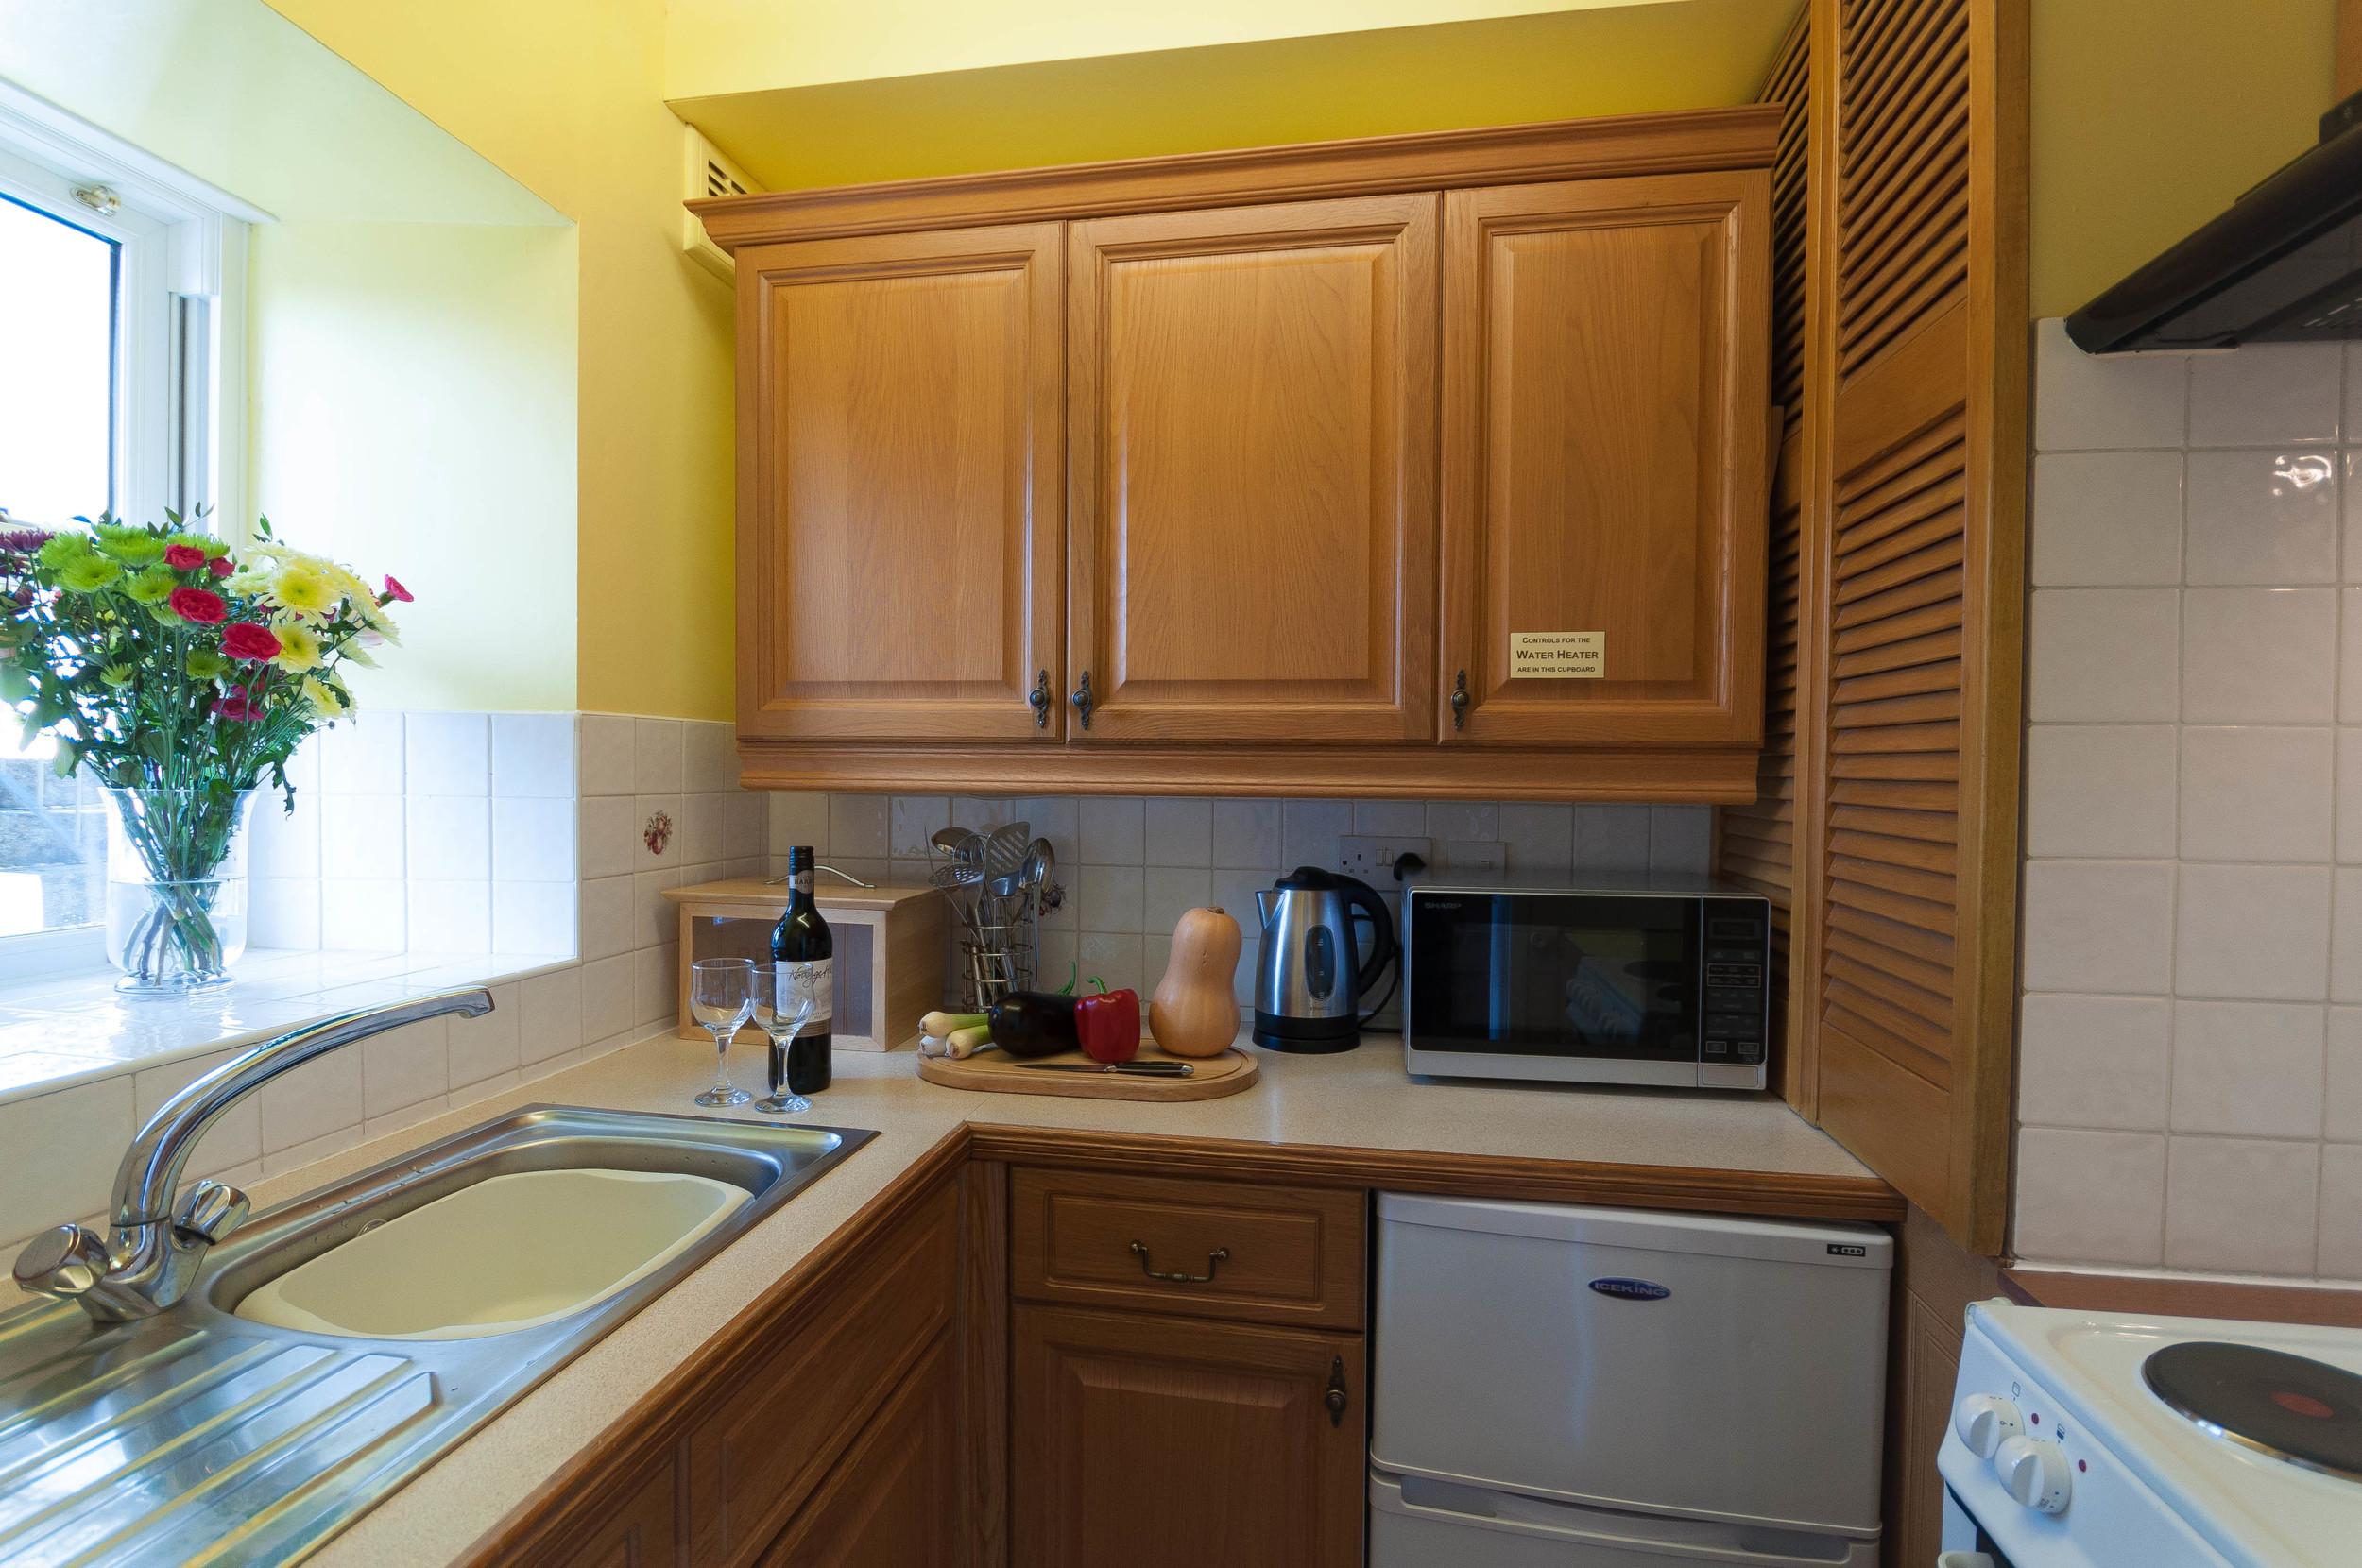 David Newman - 5 Greta Side kitchen3.jpg